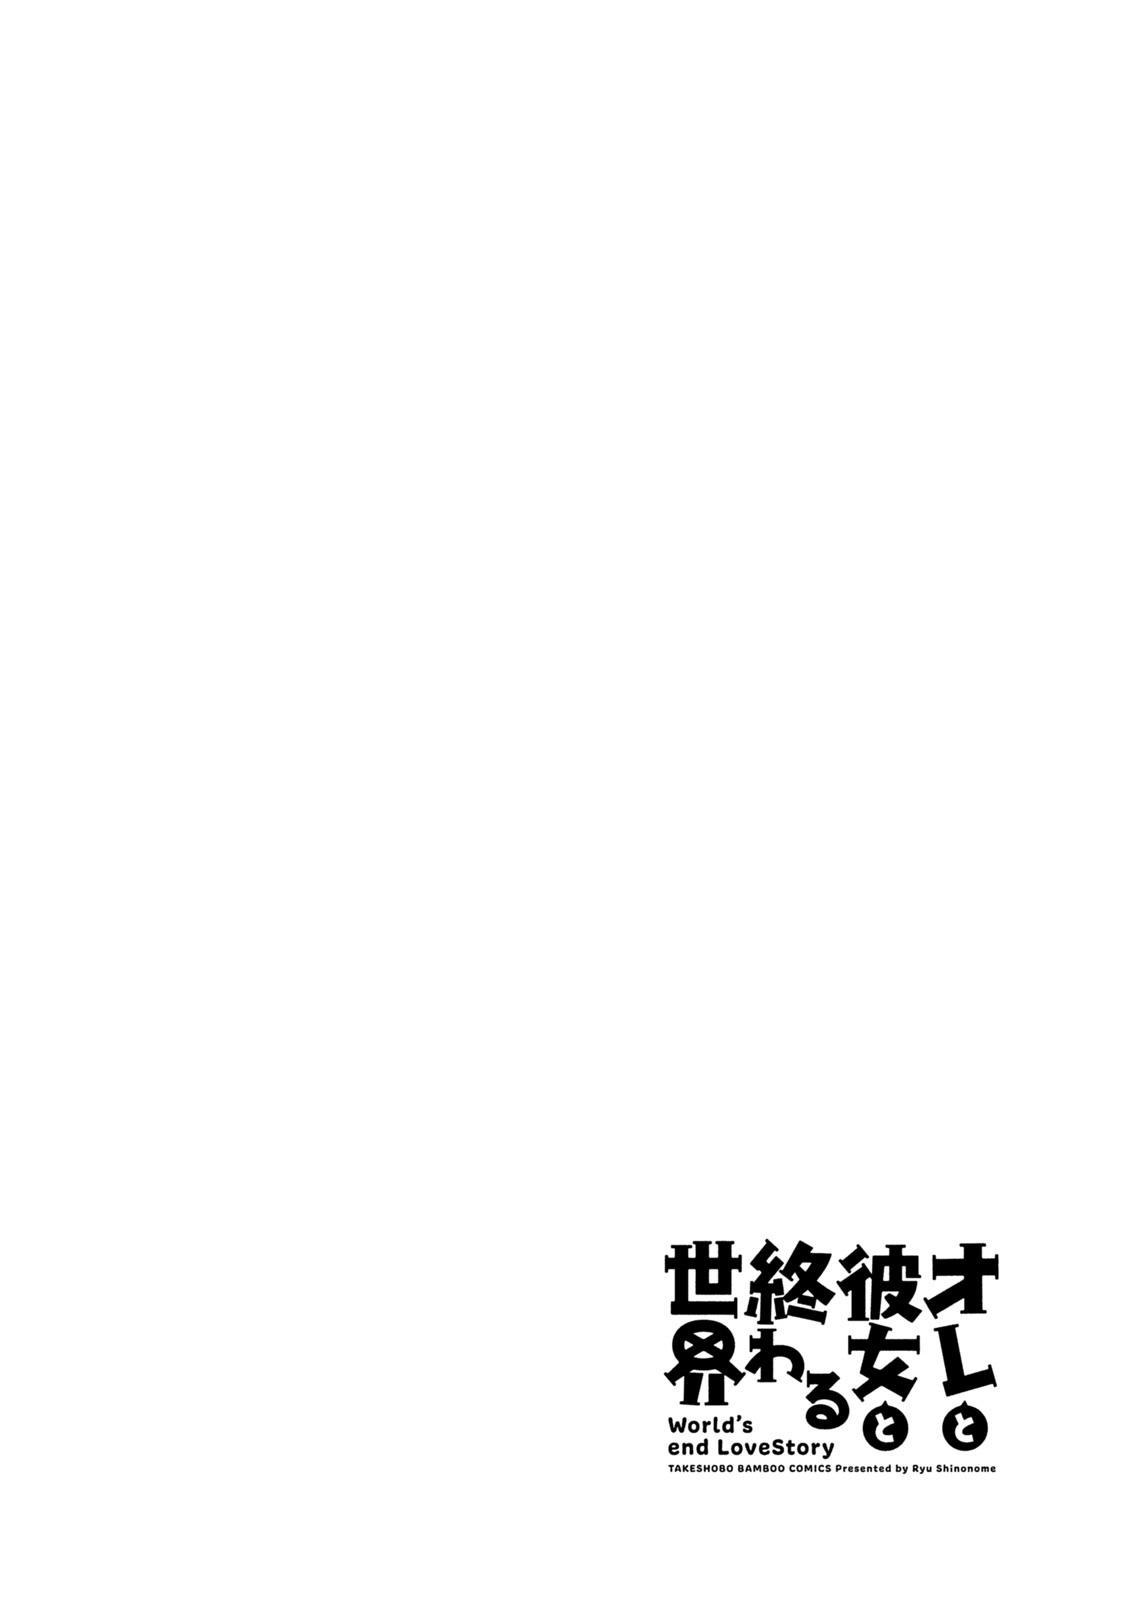 [Shinonome Ryu] Ore to Kanojo to Owaru Sekai - World's end LoveStory ch.10-13 [Chinese] [爱弹幕汉化组] [Digital] 25